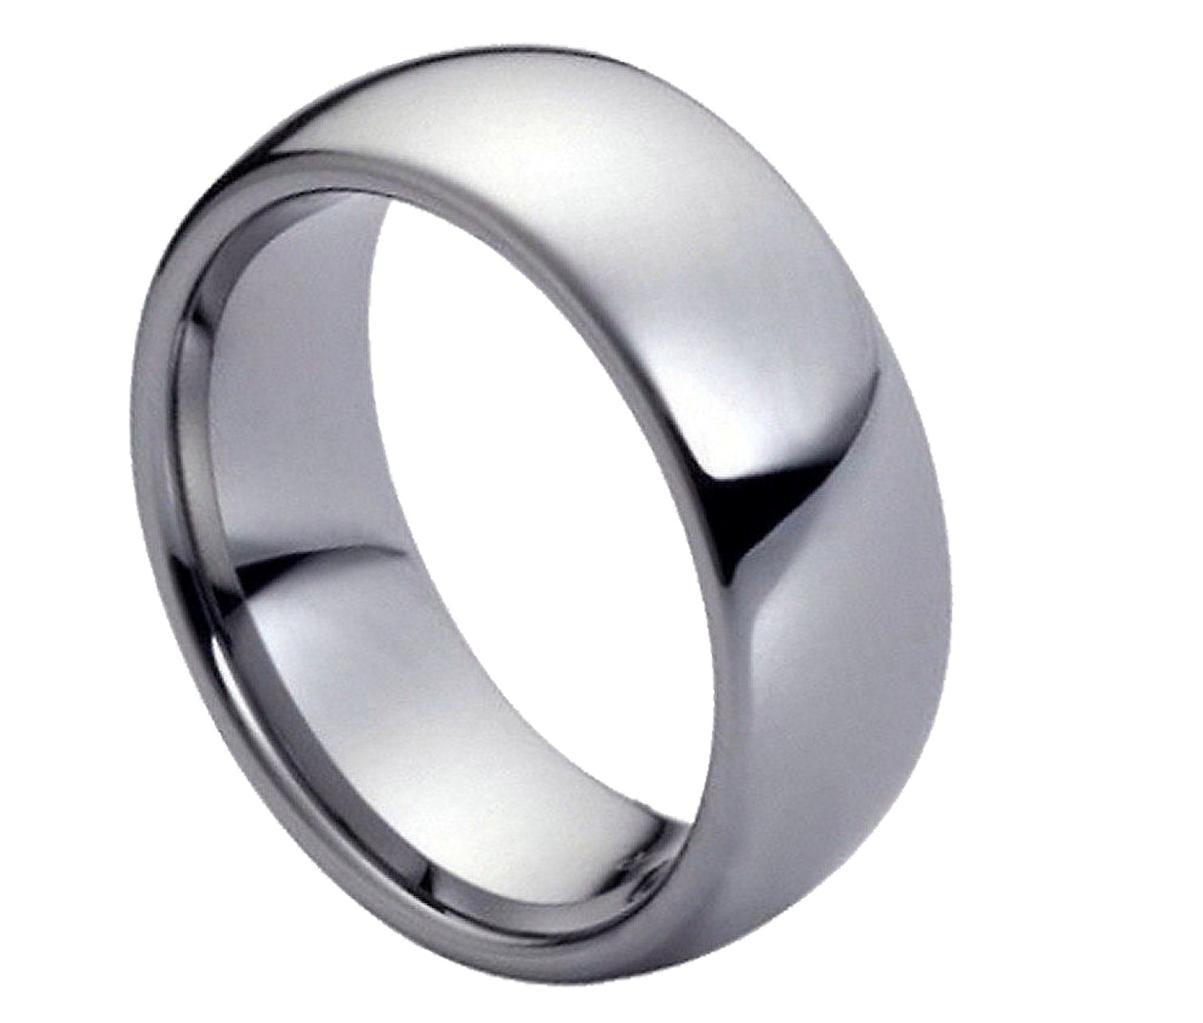 tungsten carbide wedding band Black Tungsten Carbide Wedding Band Ring Mens Jewelry